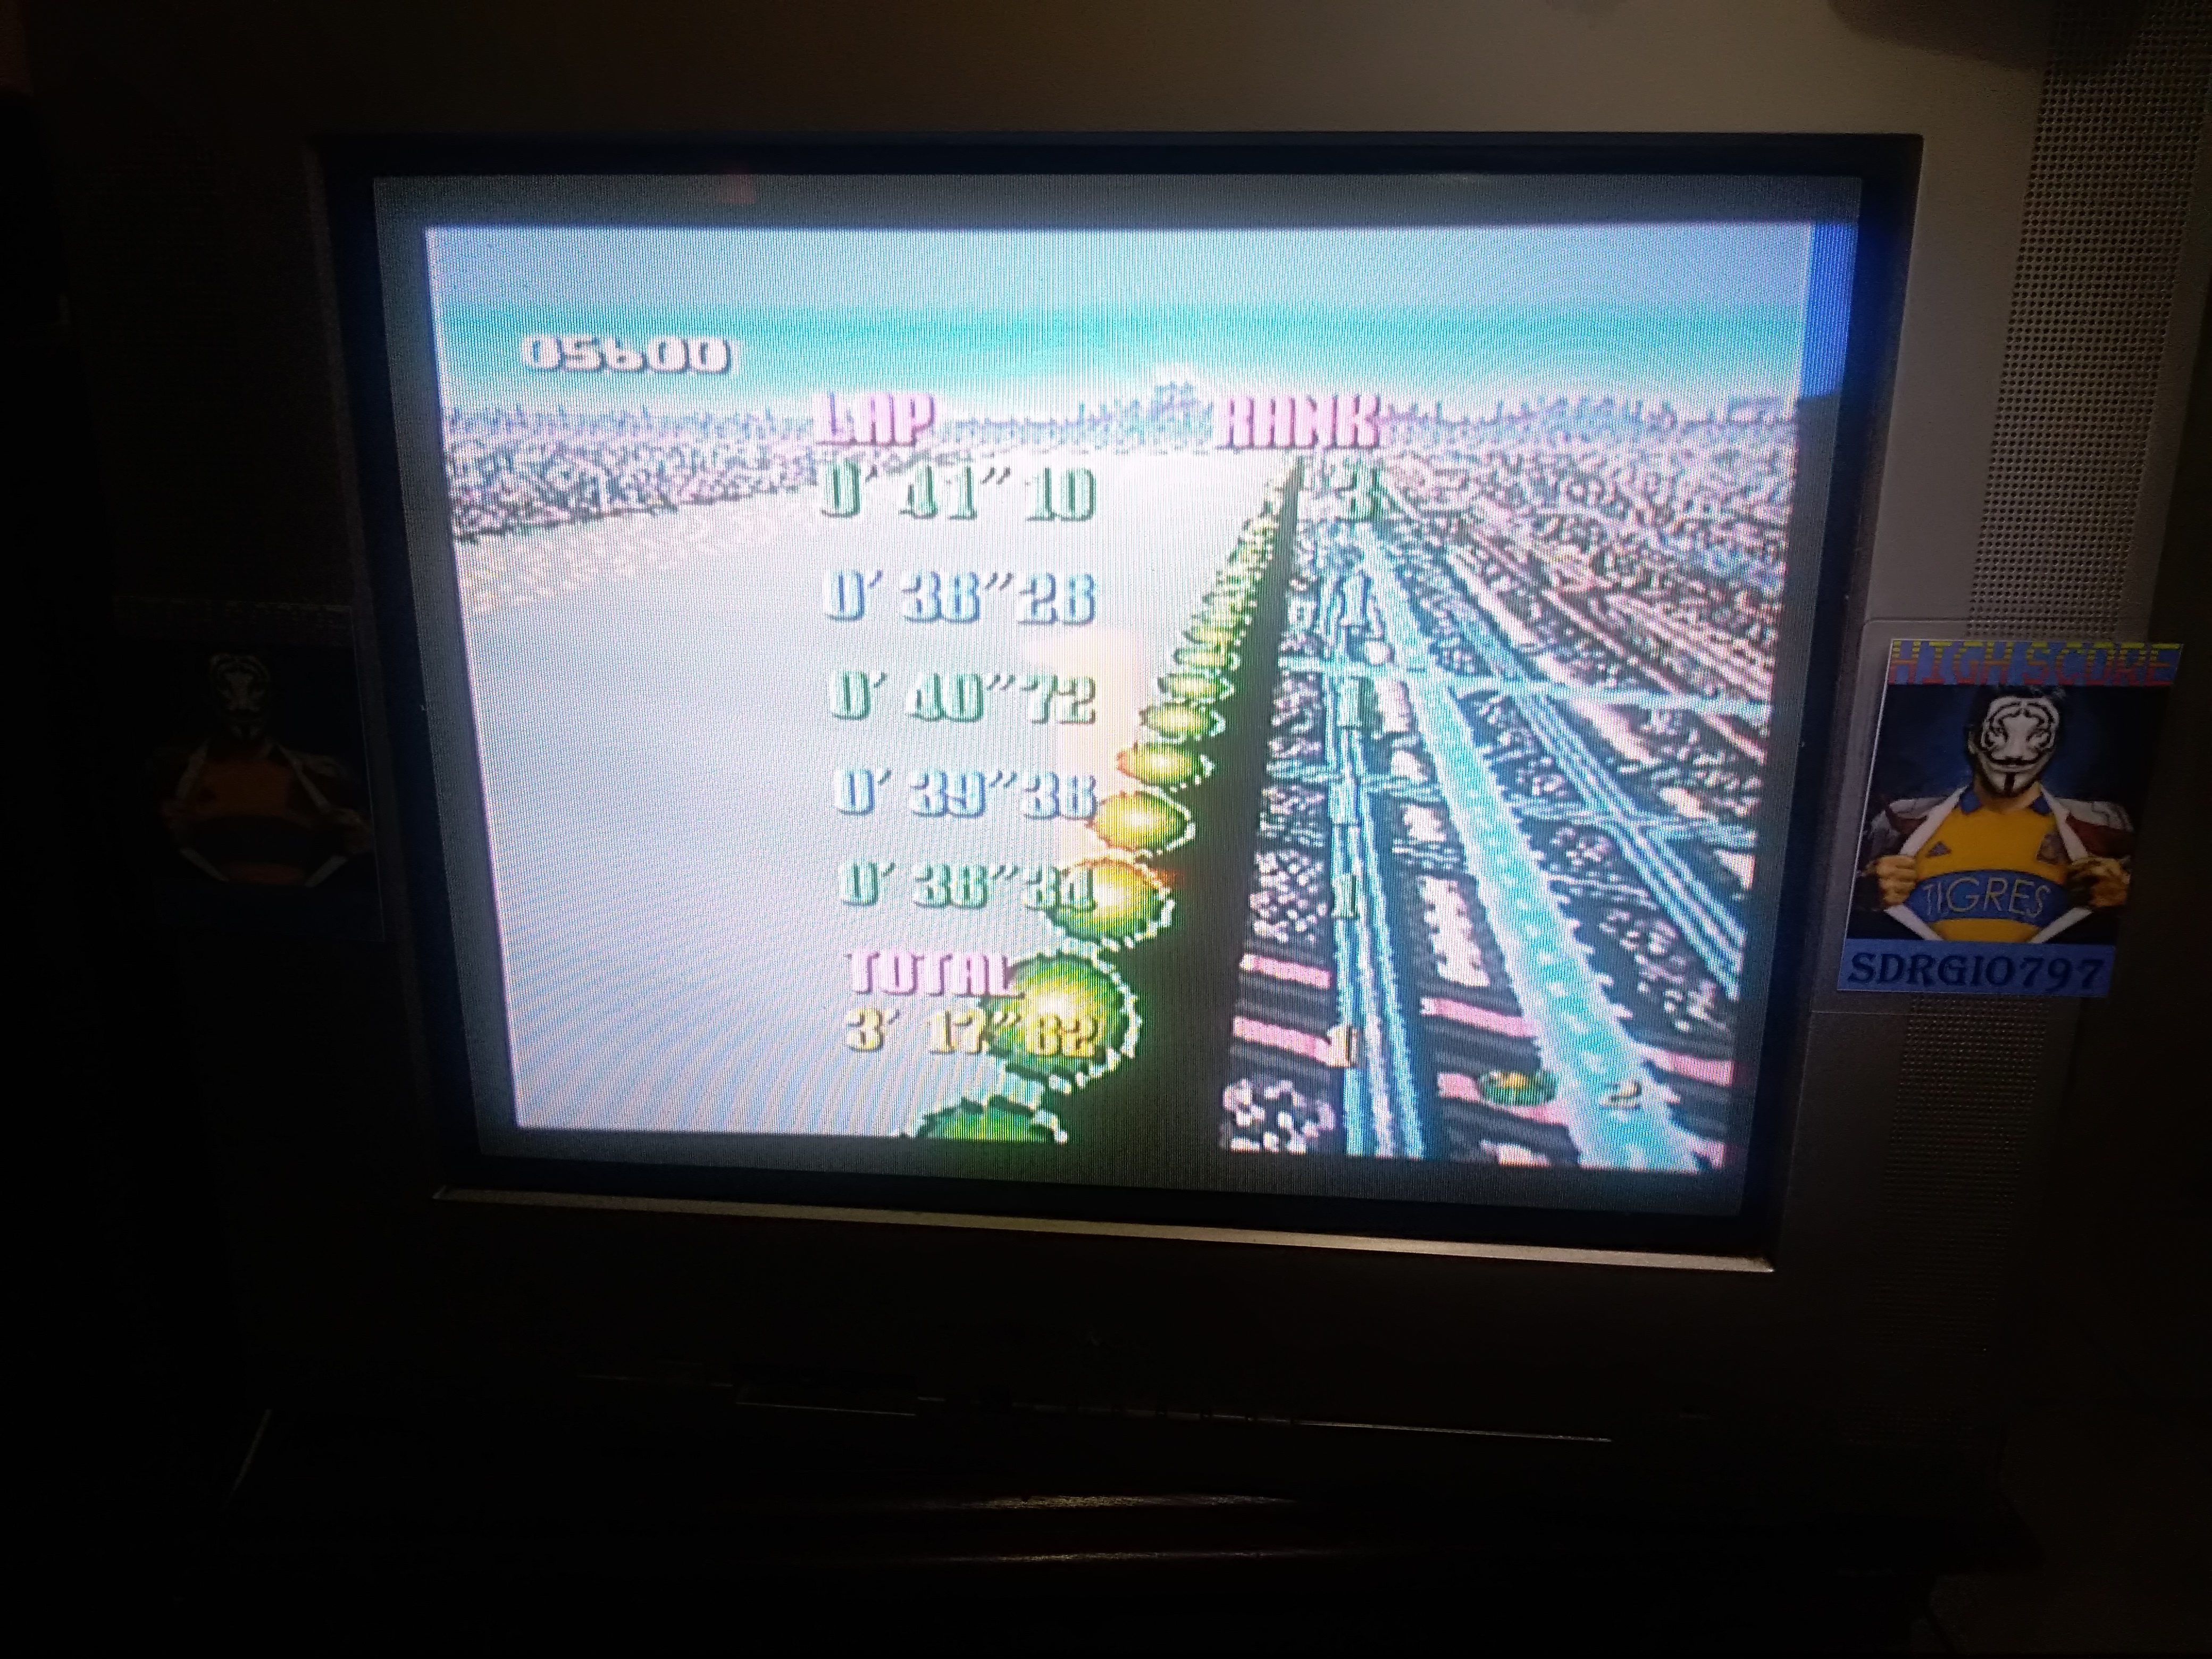 Sdrgio797: F-Zero (SNES/Super Famicom Emulated) 5,600 points on 2020-07-29 11:21:54